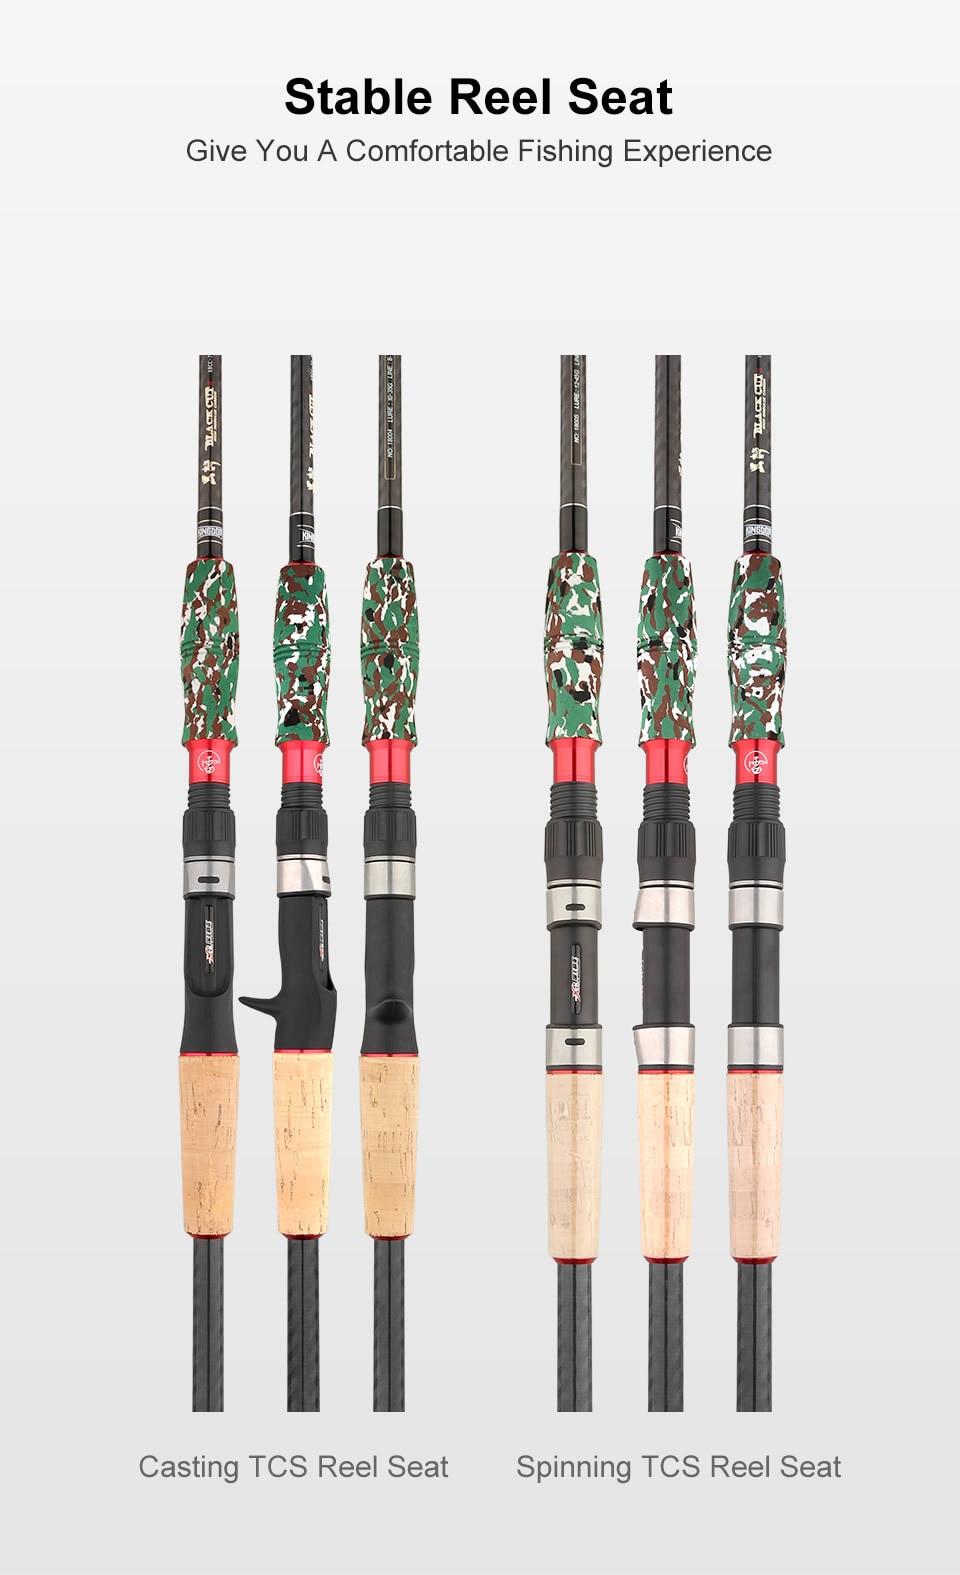 Kingdom Black Cut Spinning Casting Fishing Rod Carton MH, H Power Ultralight Telescopic Fishing Rods 2.39m, 2.49m Travel Rod (11)